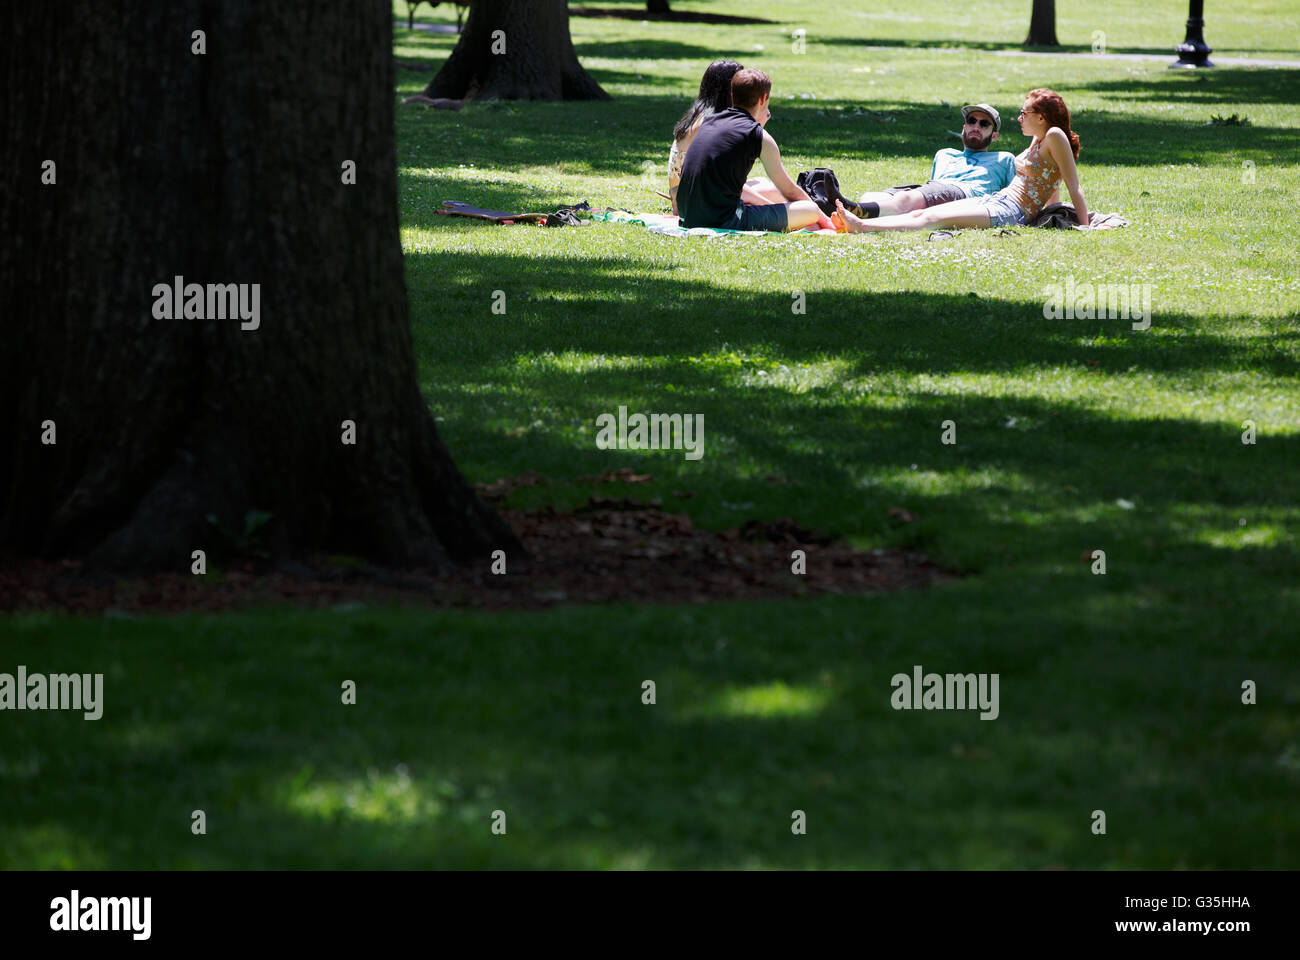 Boston Public Garden - Stock Image